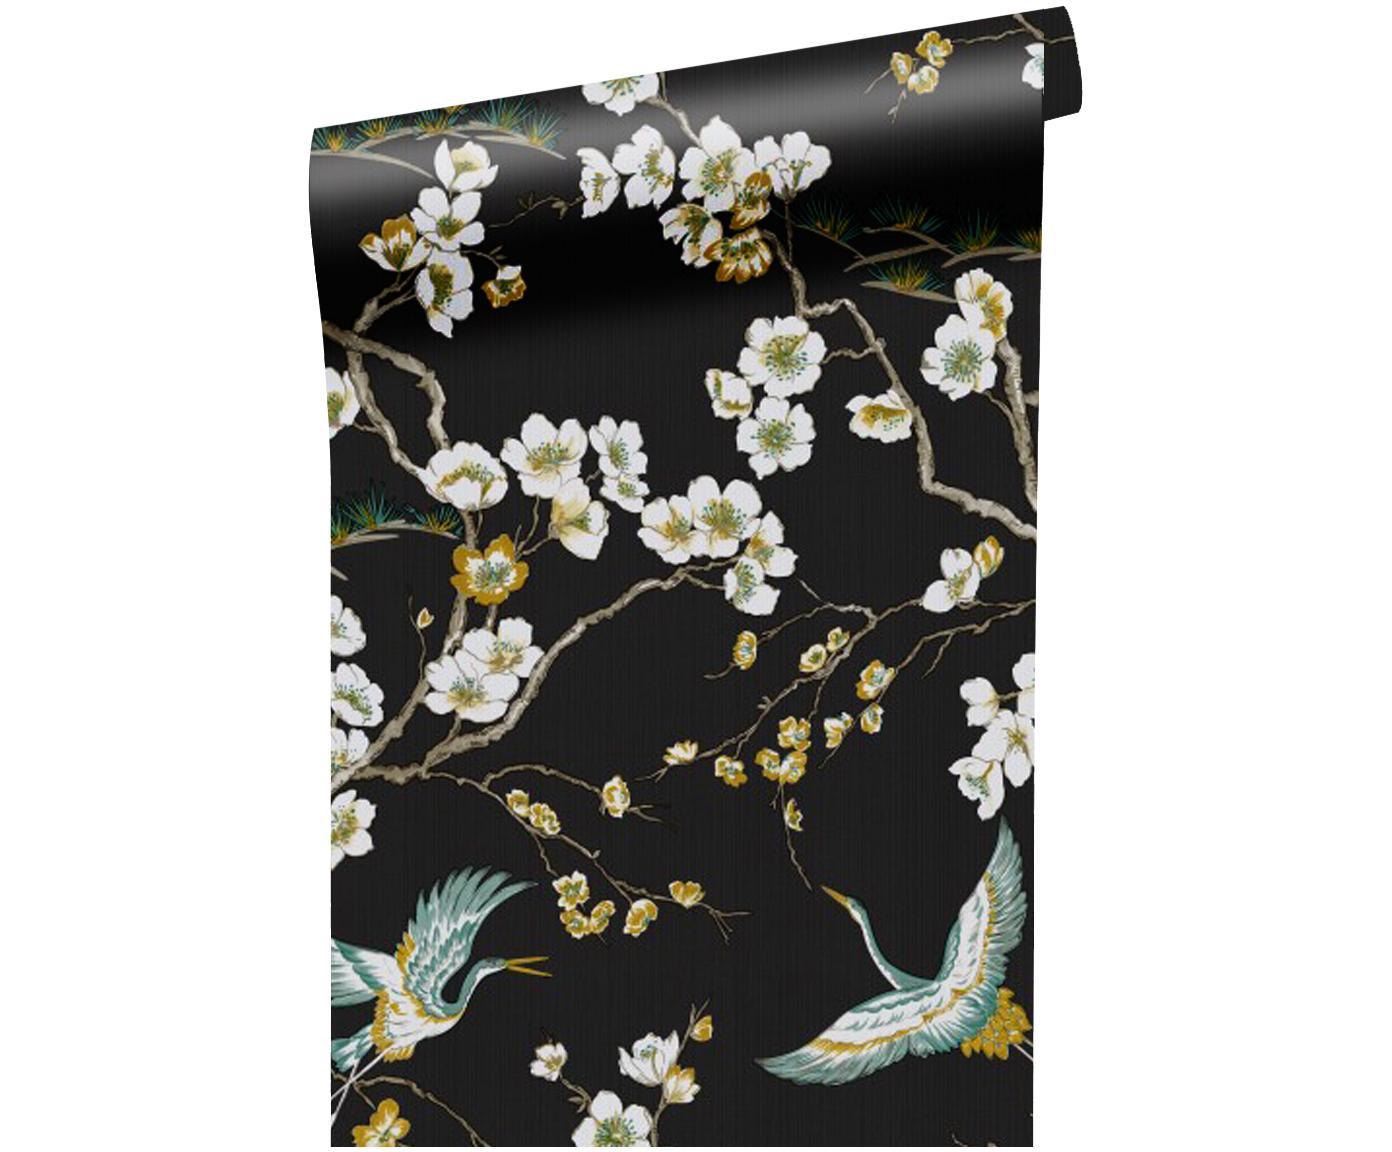 Papel pintado Japanese Flowers, Tejido no tejido, Negro, blanco, azul, amarillo, An 52 x L 1005 cm